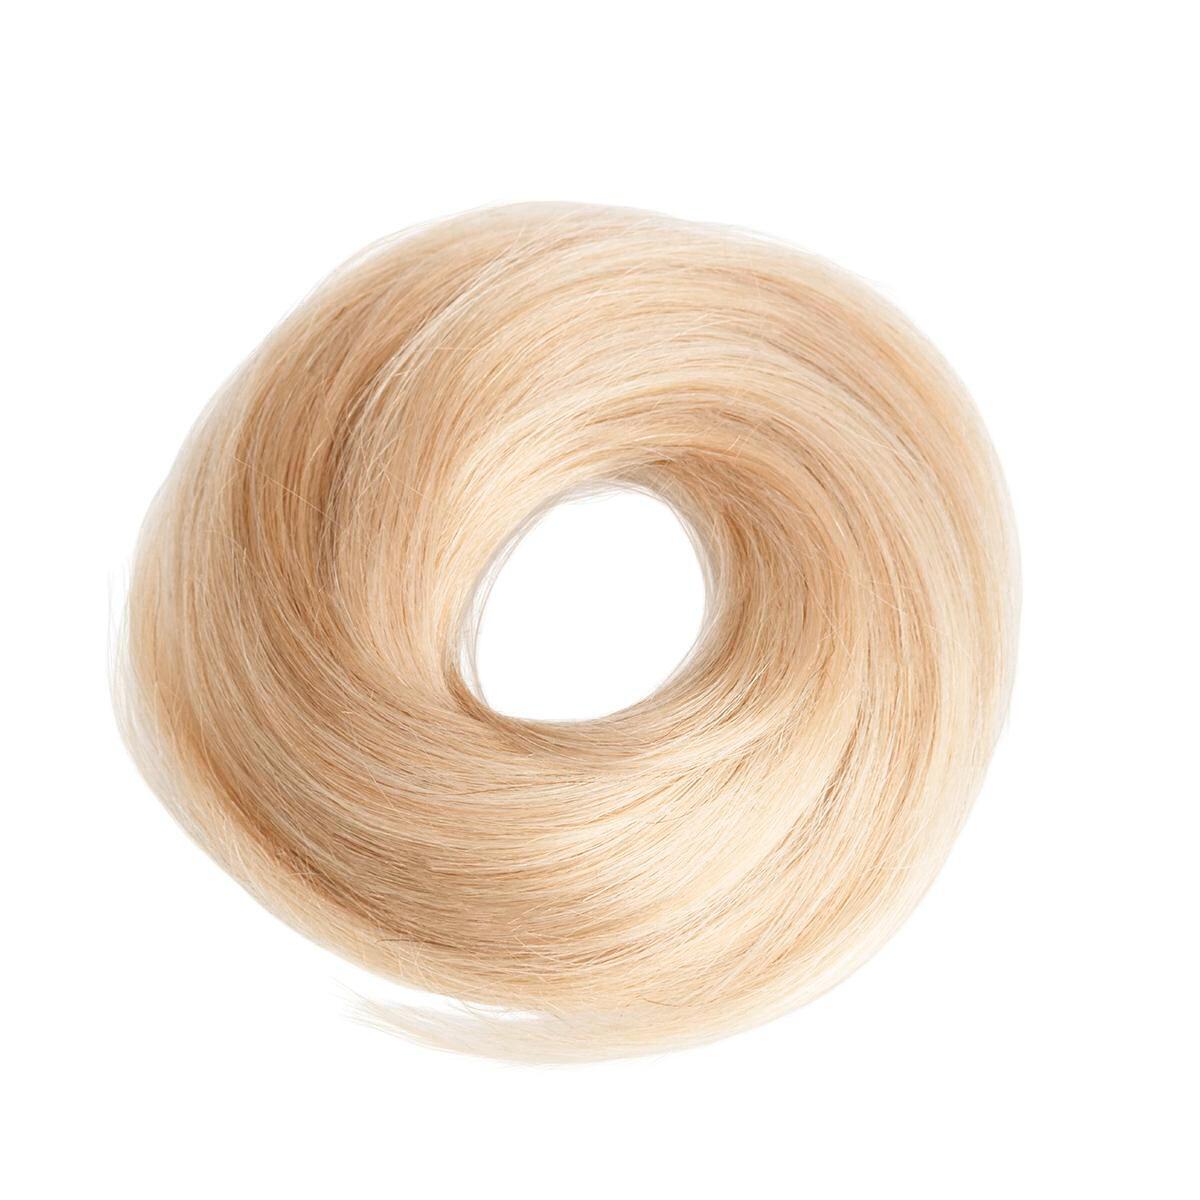 Volume Hair Scrunchie Original 40 g M7.5/10.8 Scandinavian Blonde 0 cm